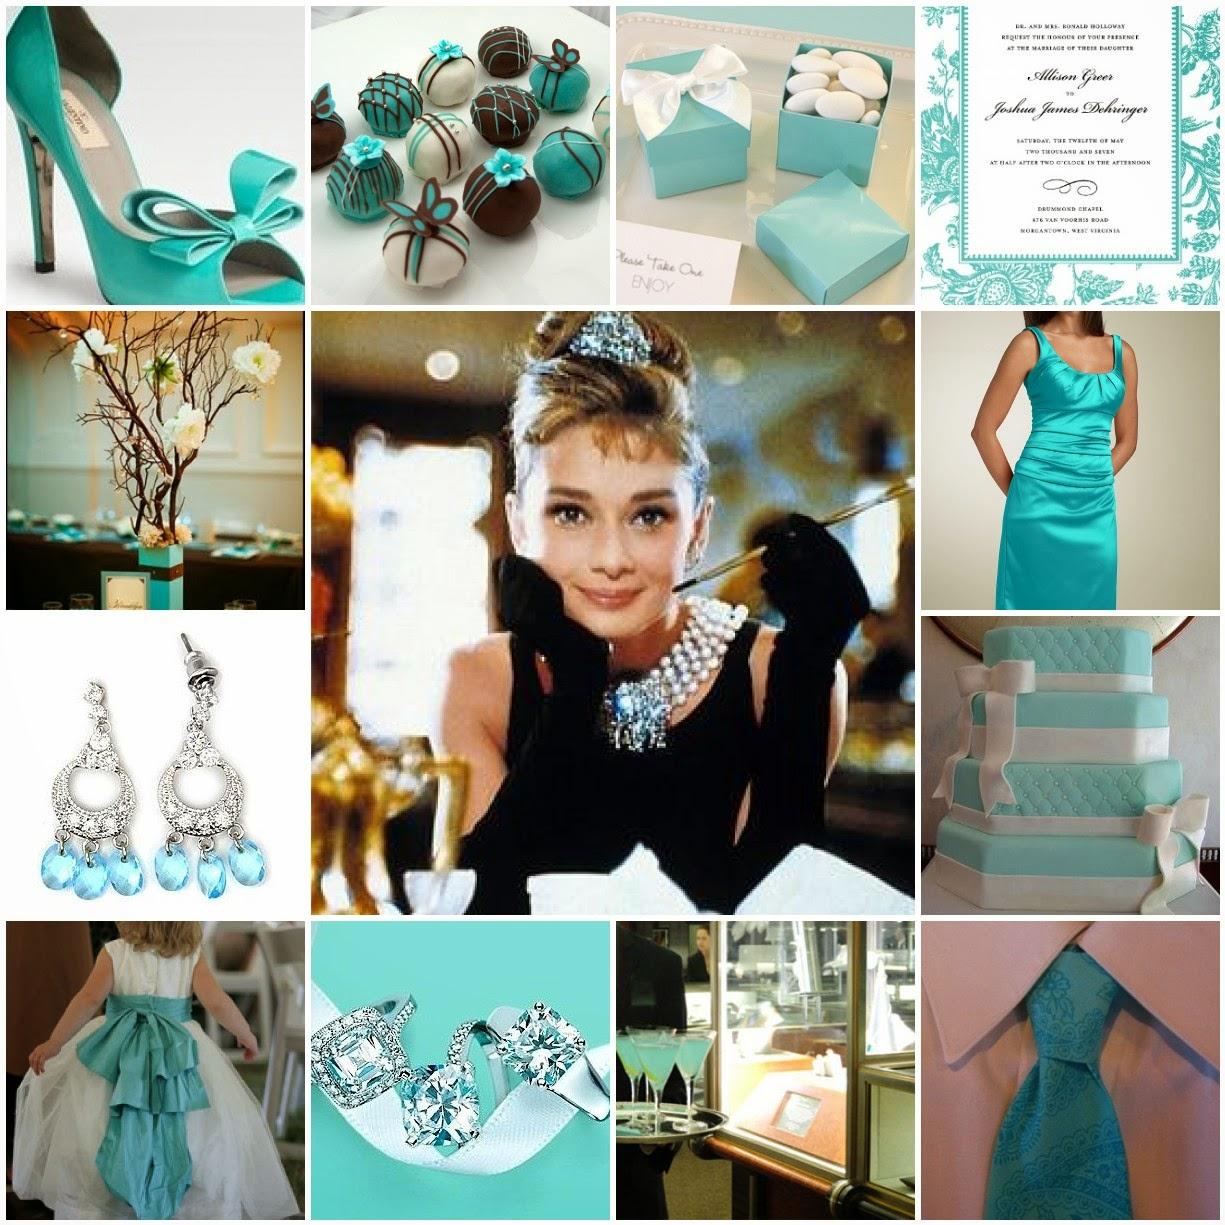 Ben noto Incanti - wedding and event creations: Matrimonio da Tiffany UH49